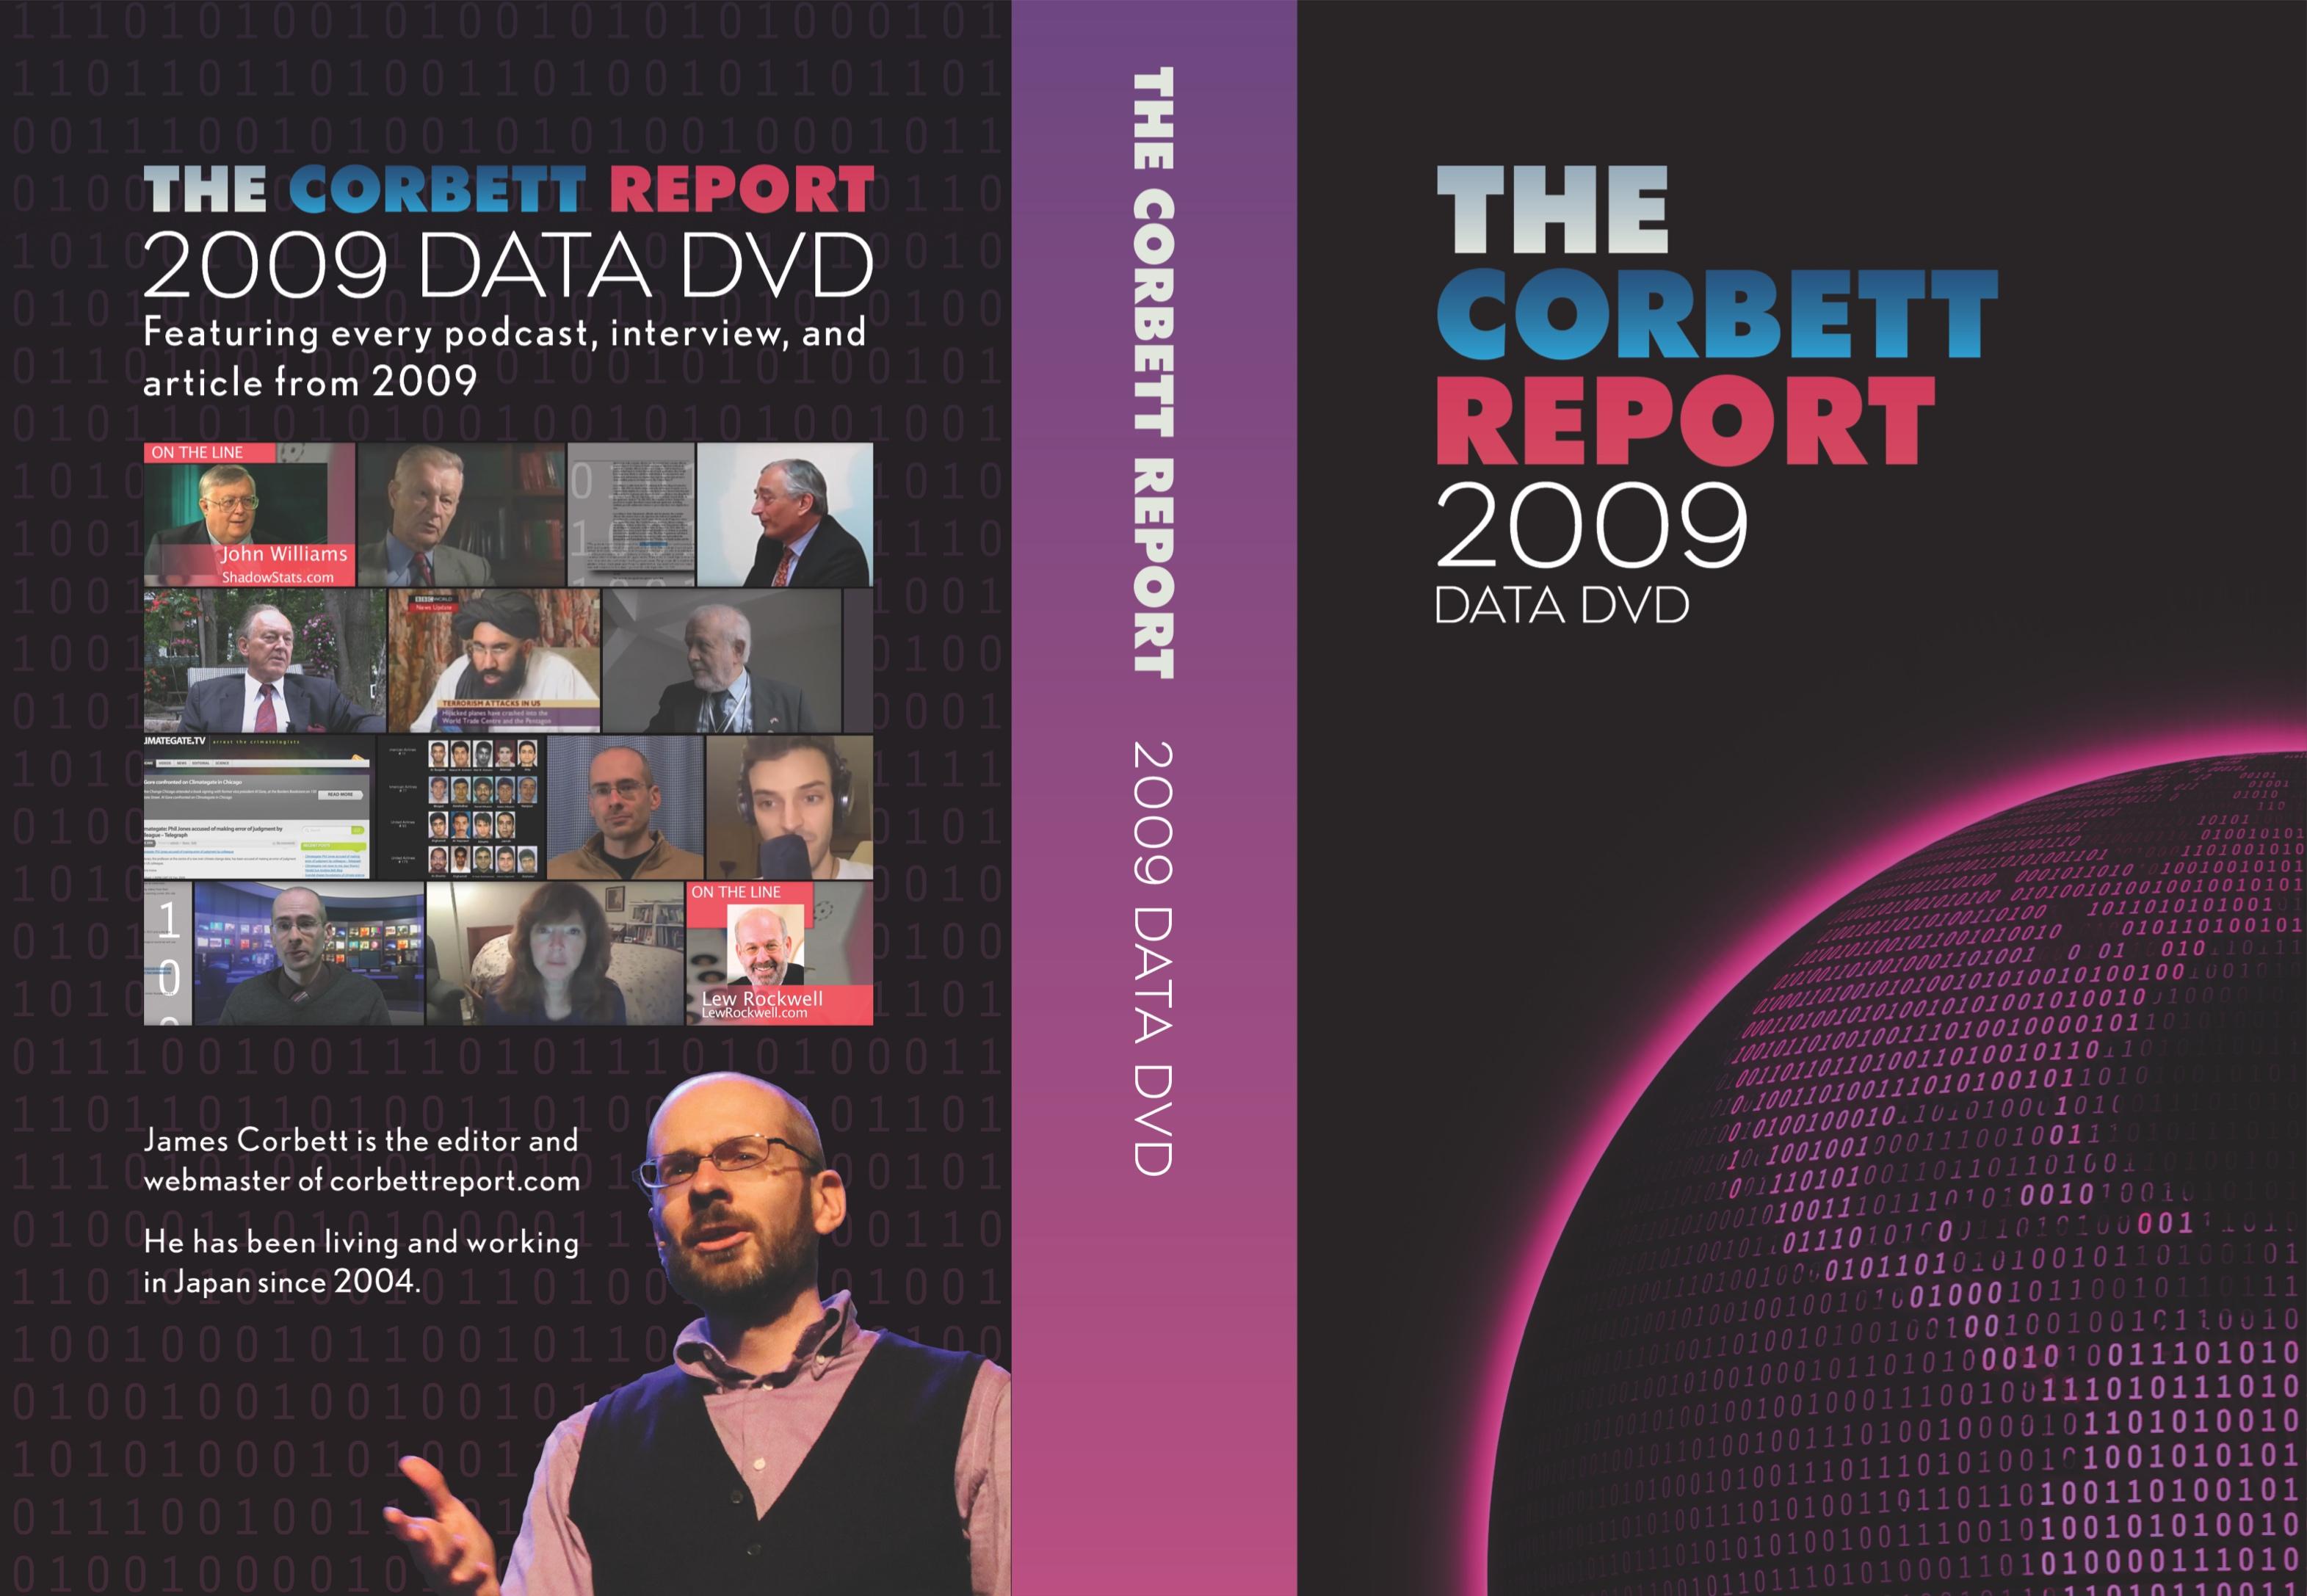 Data DVD 2009